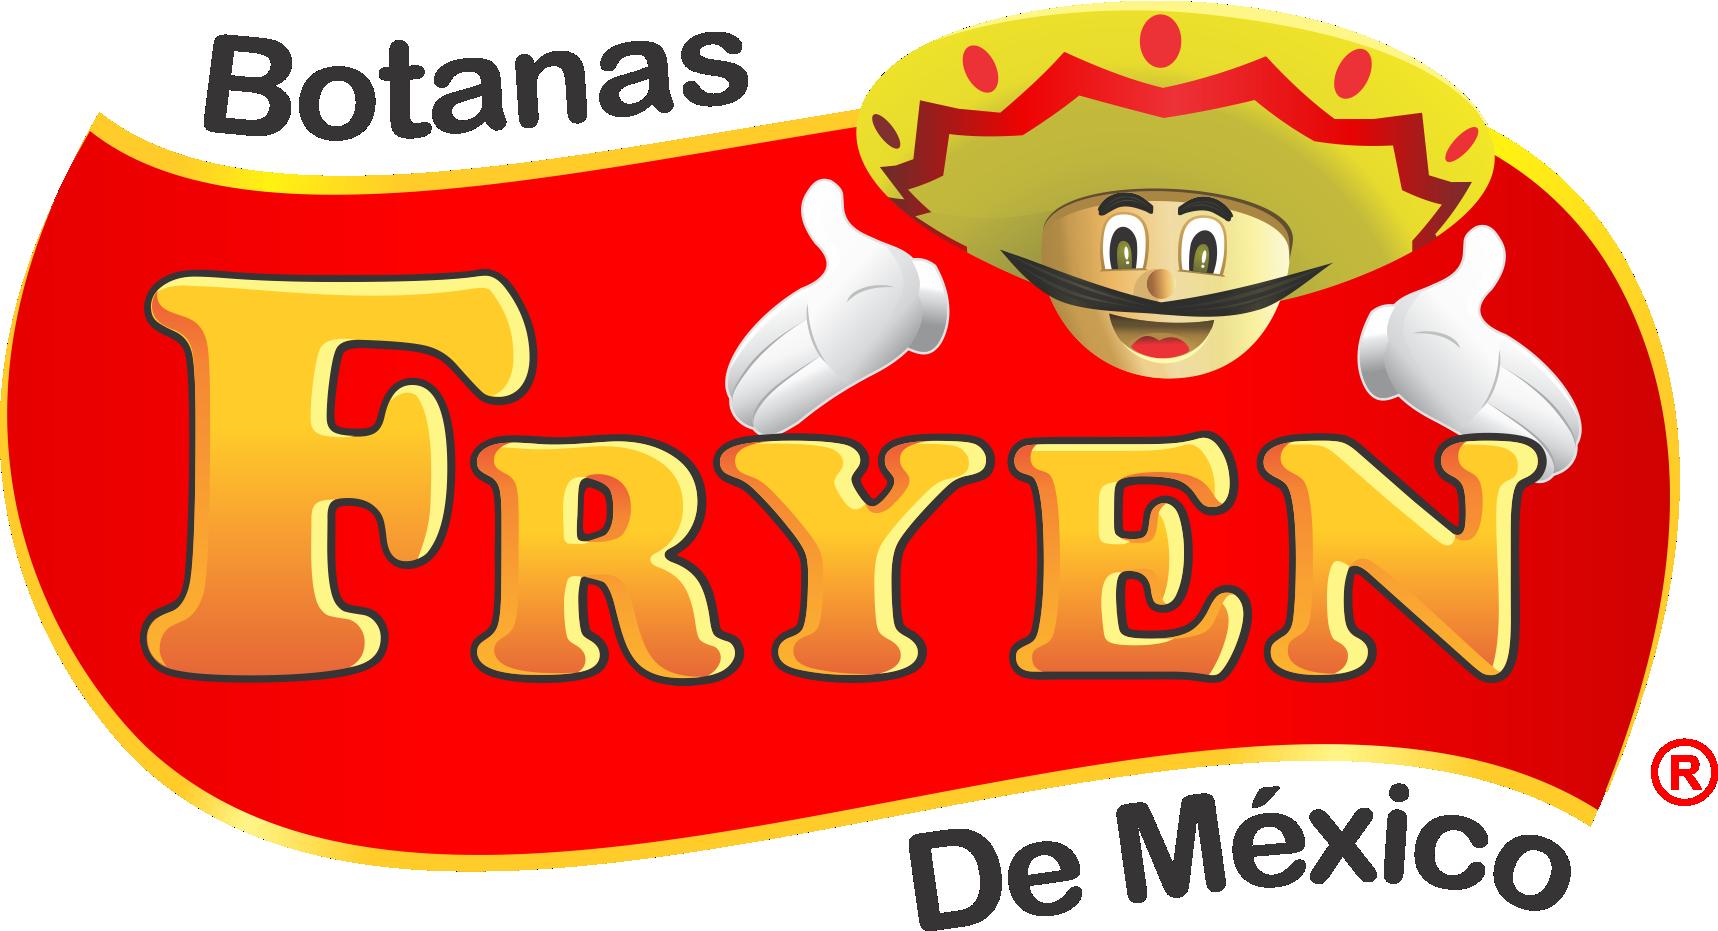 Botanas Fryen de México